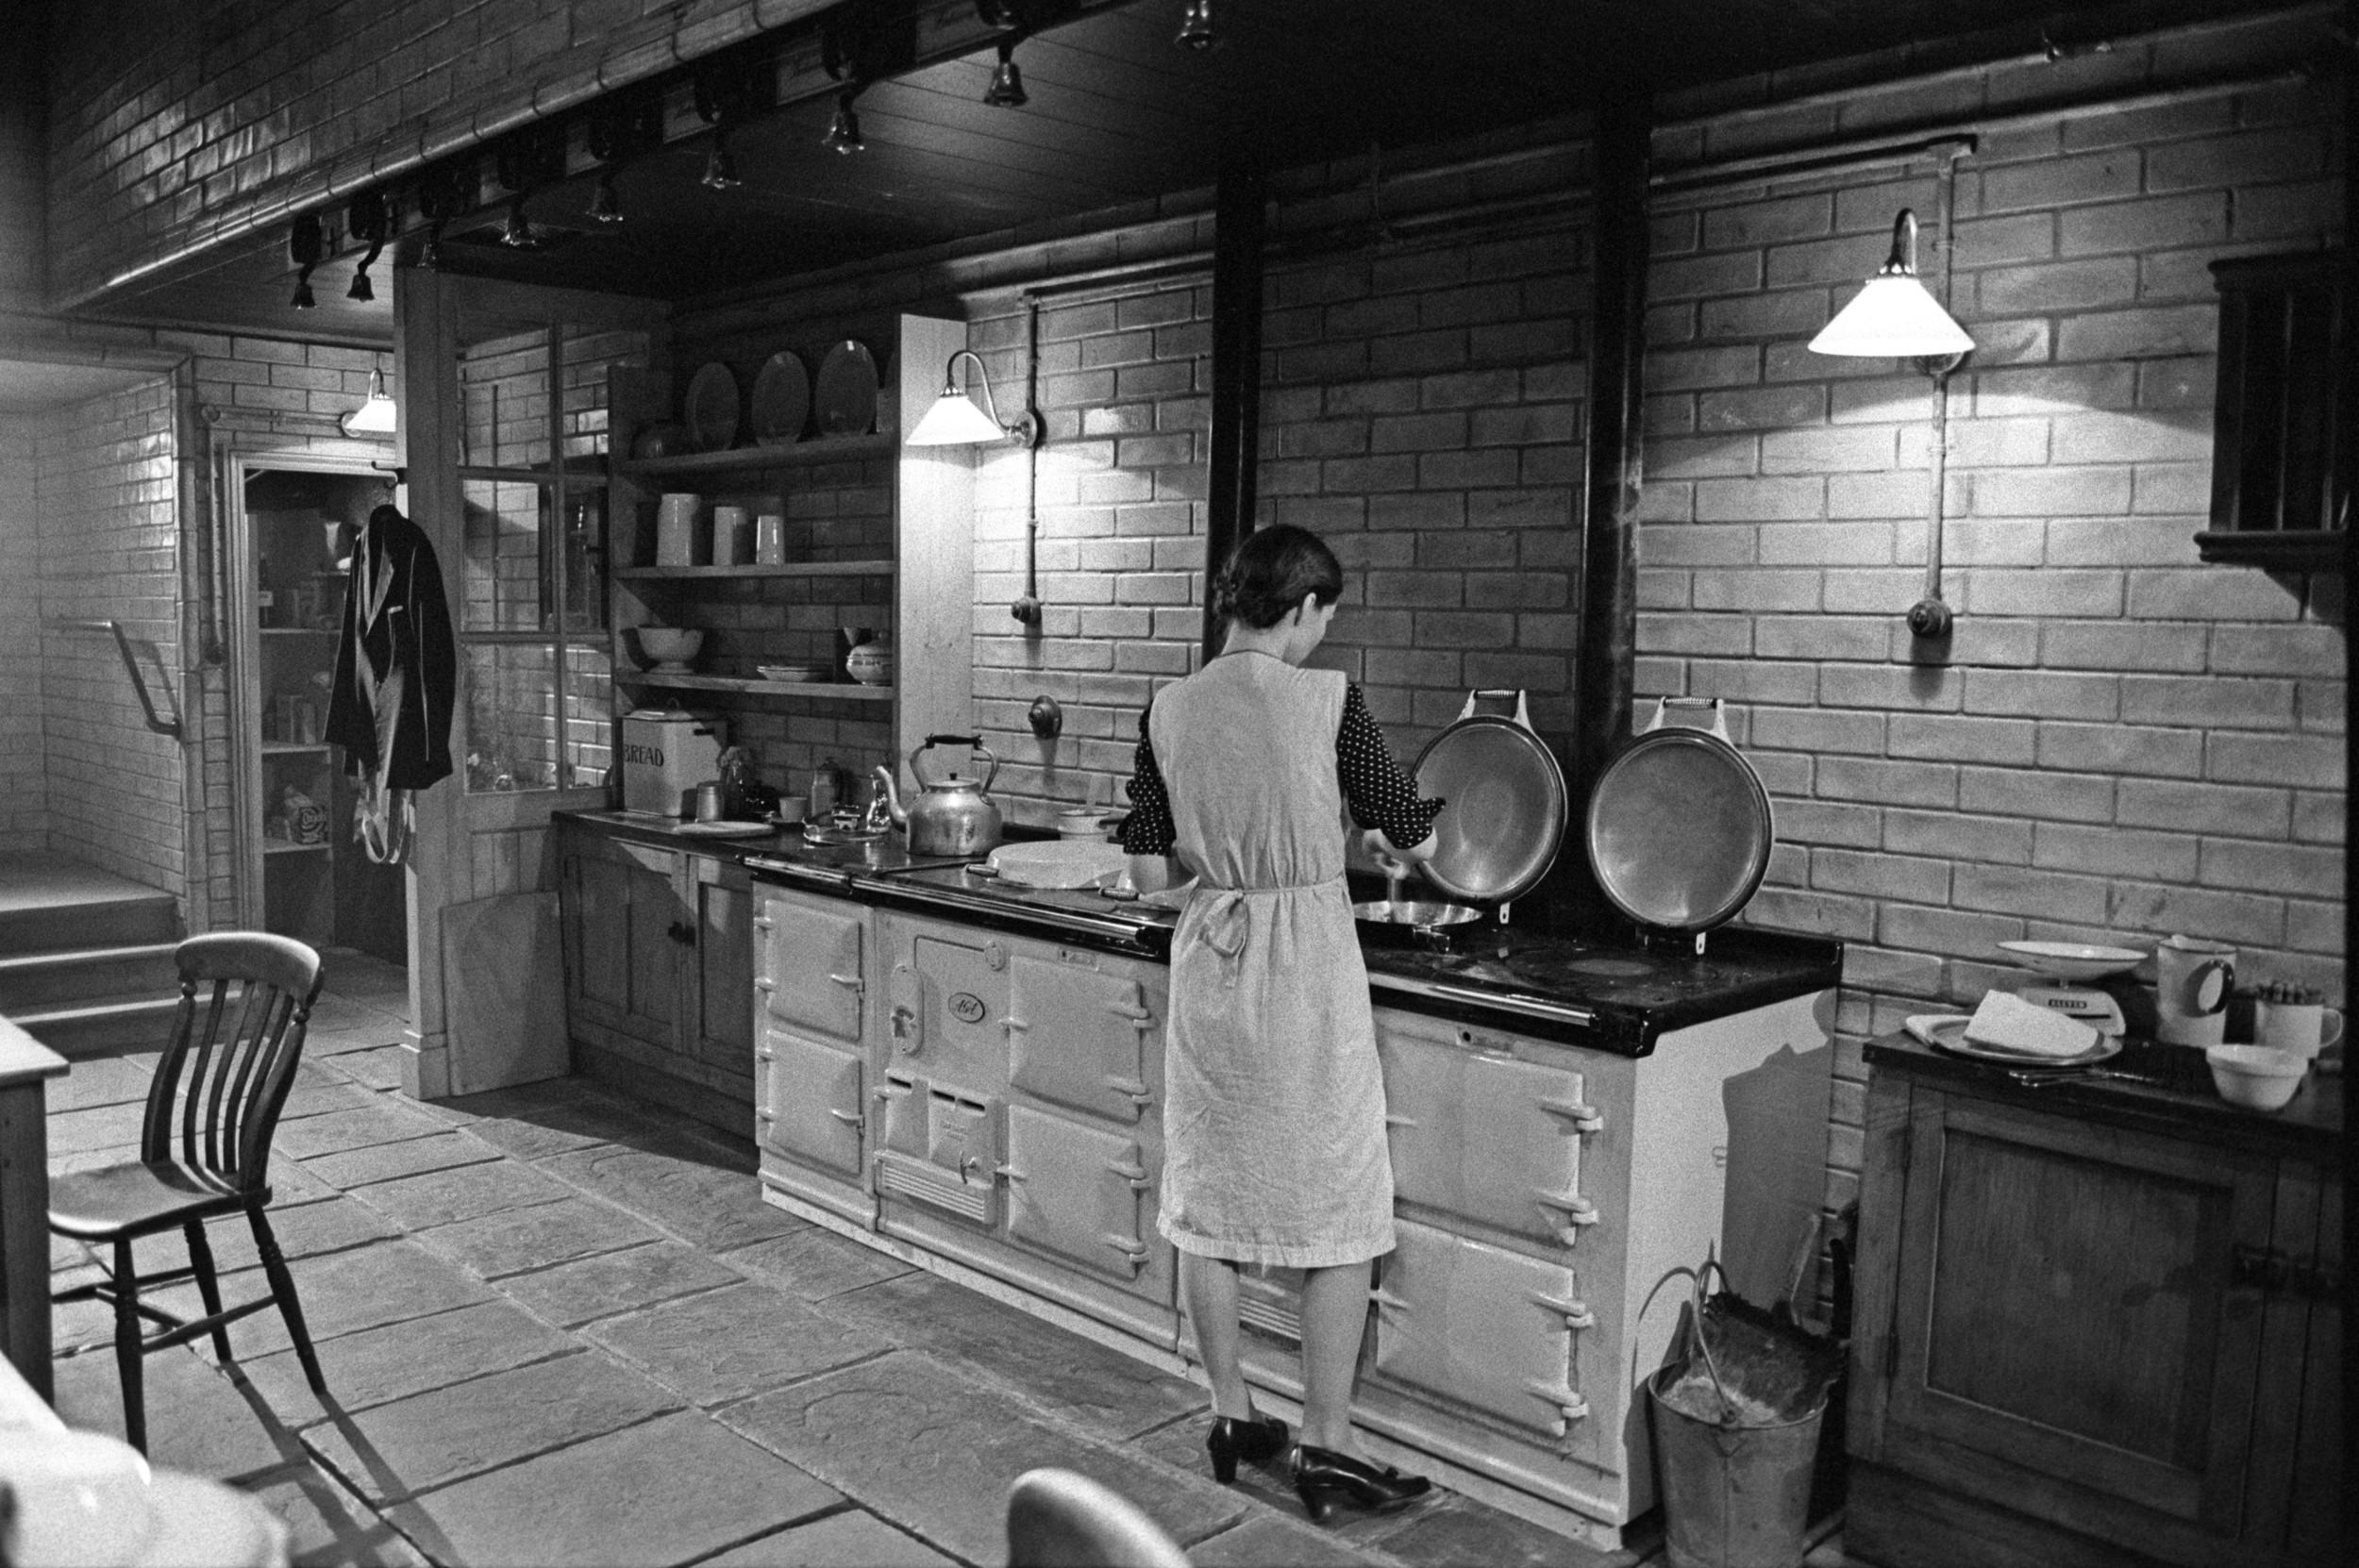 After Miss Julie-Donmar Warehouse 004.jpg